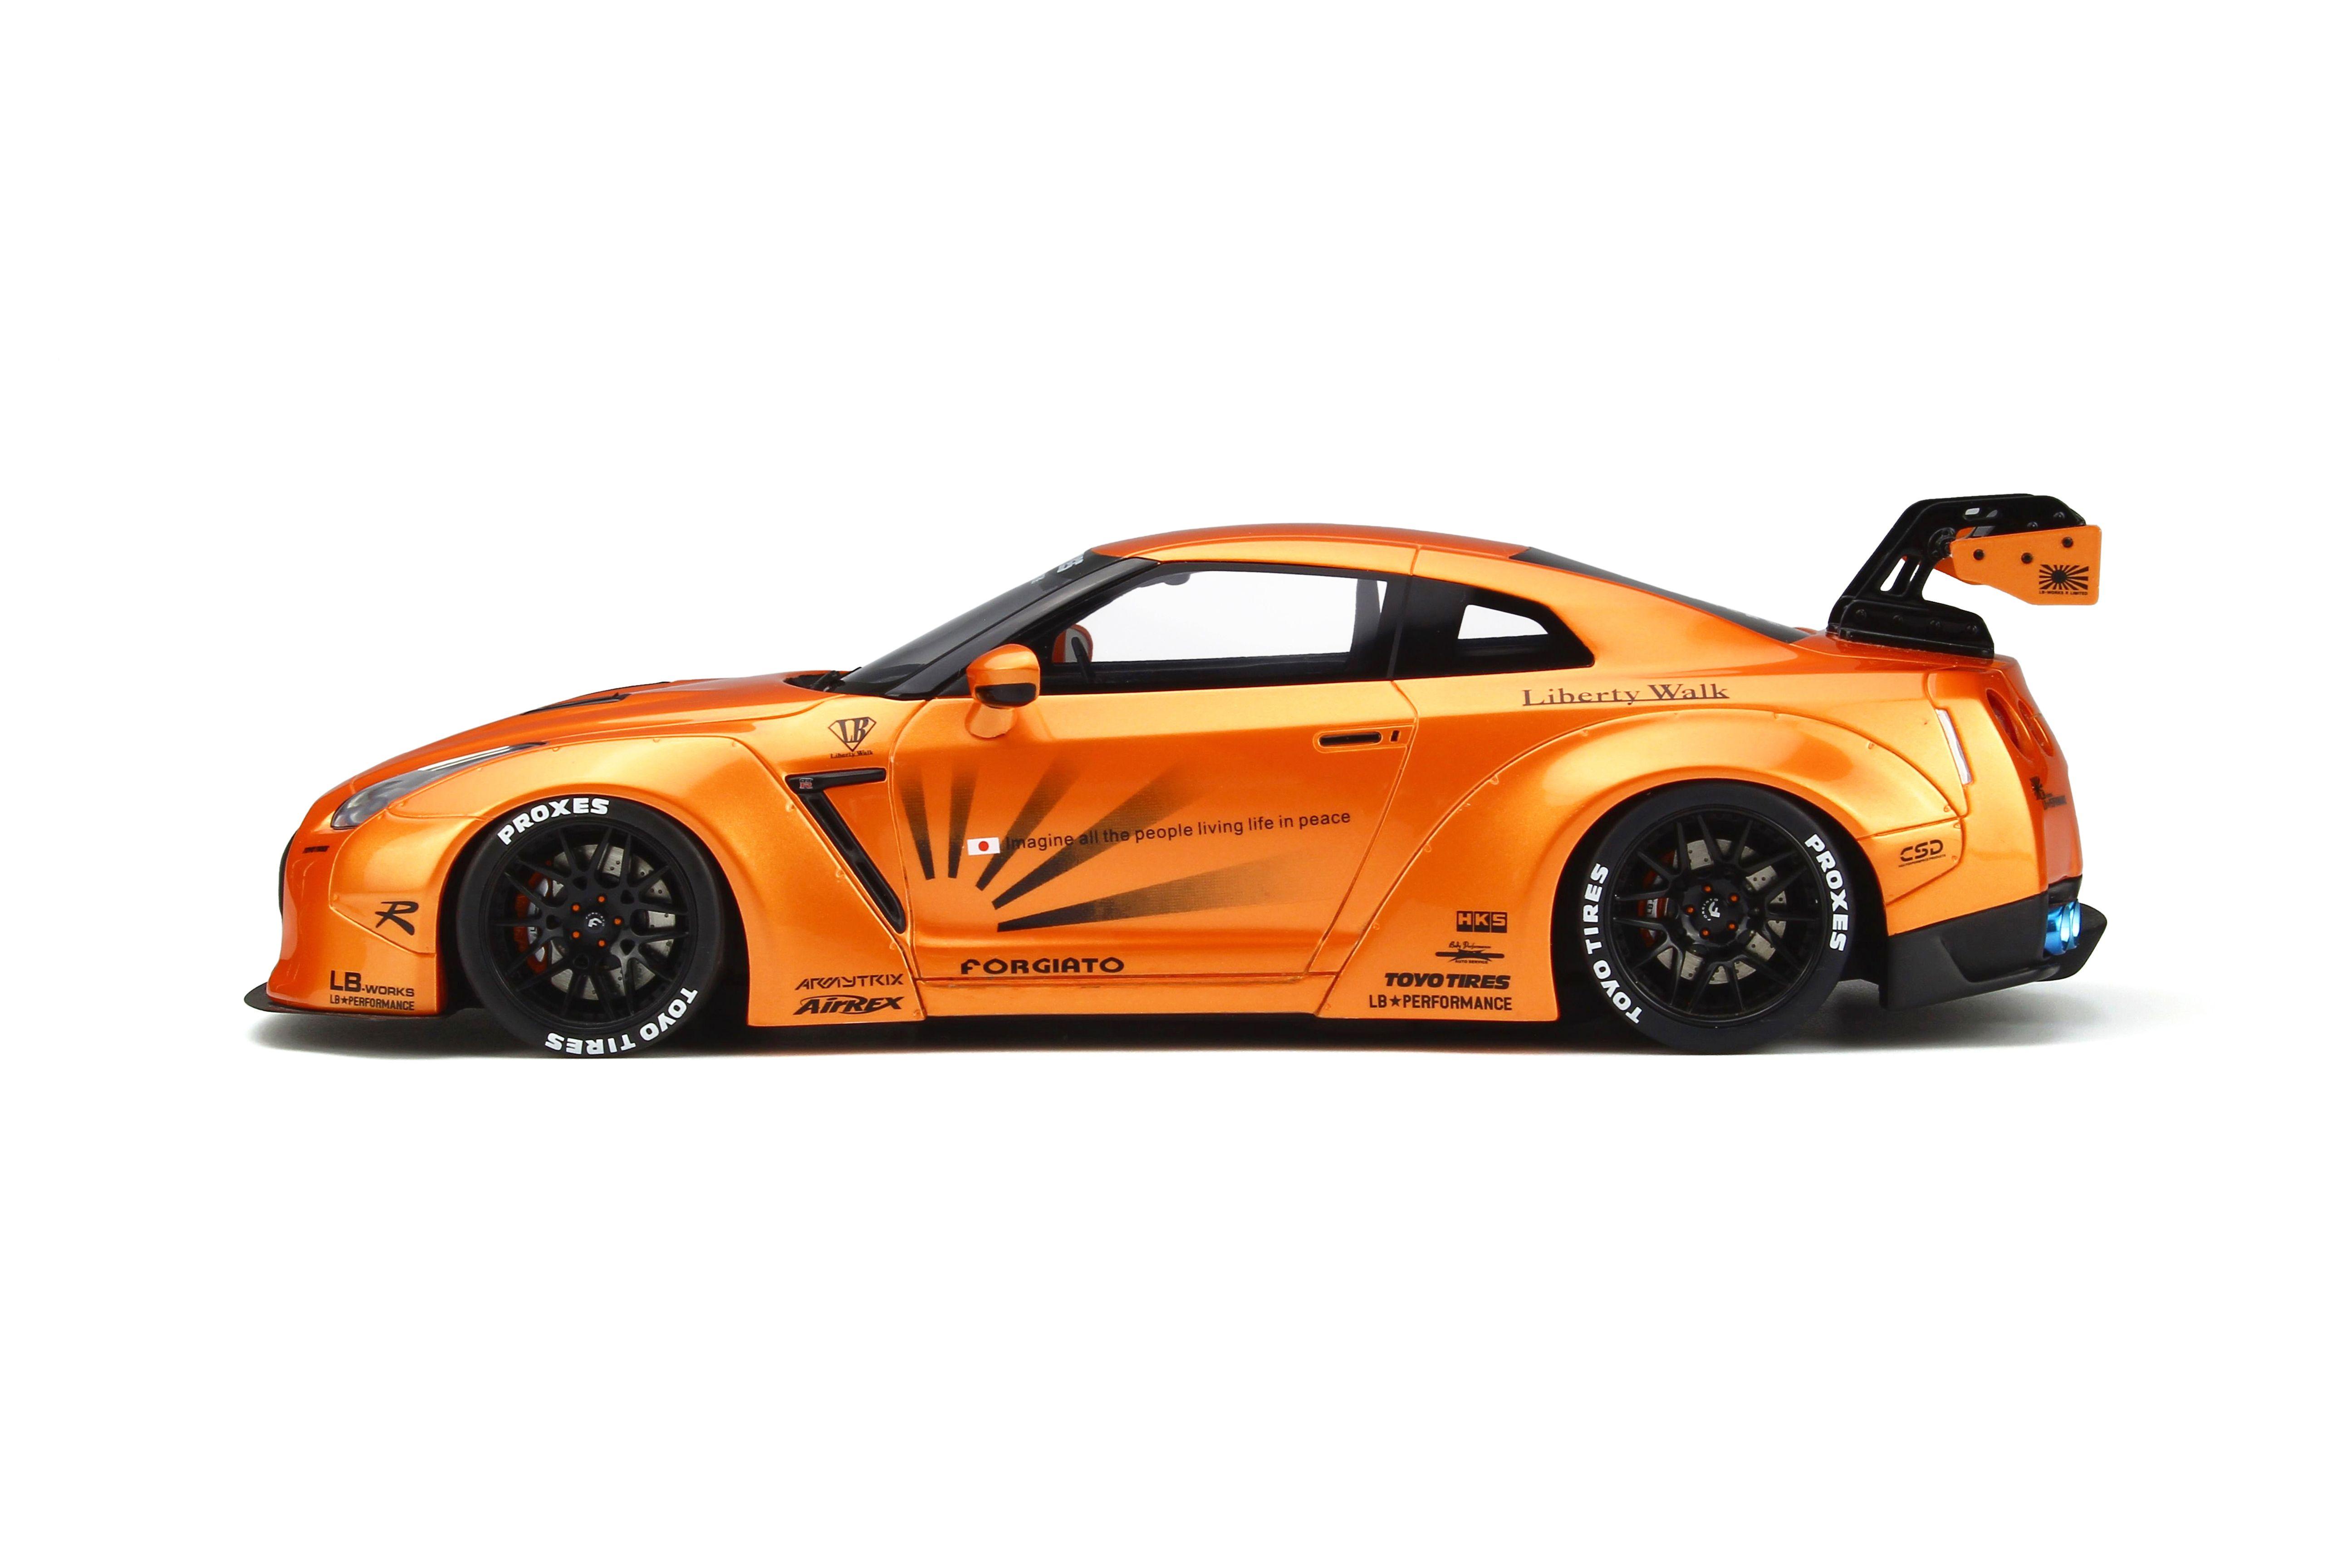 Nissan GTR R35 Liberty Works orange metallic GT Spirit GT742 LE 999